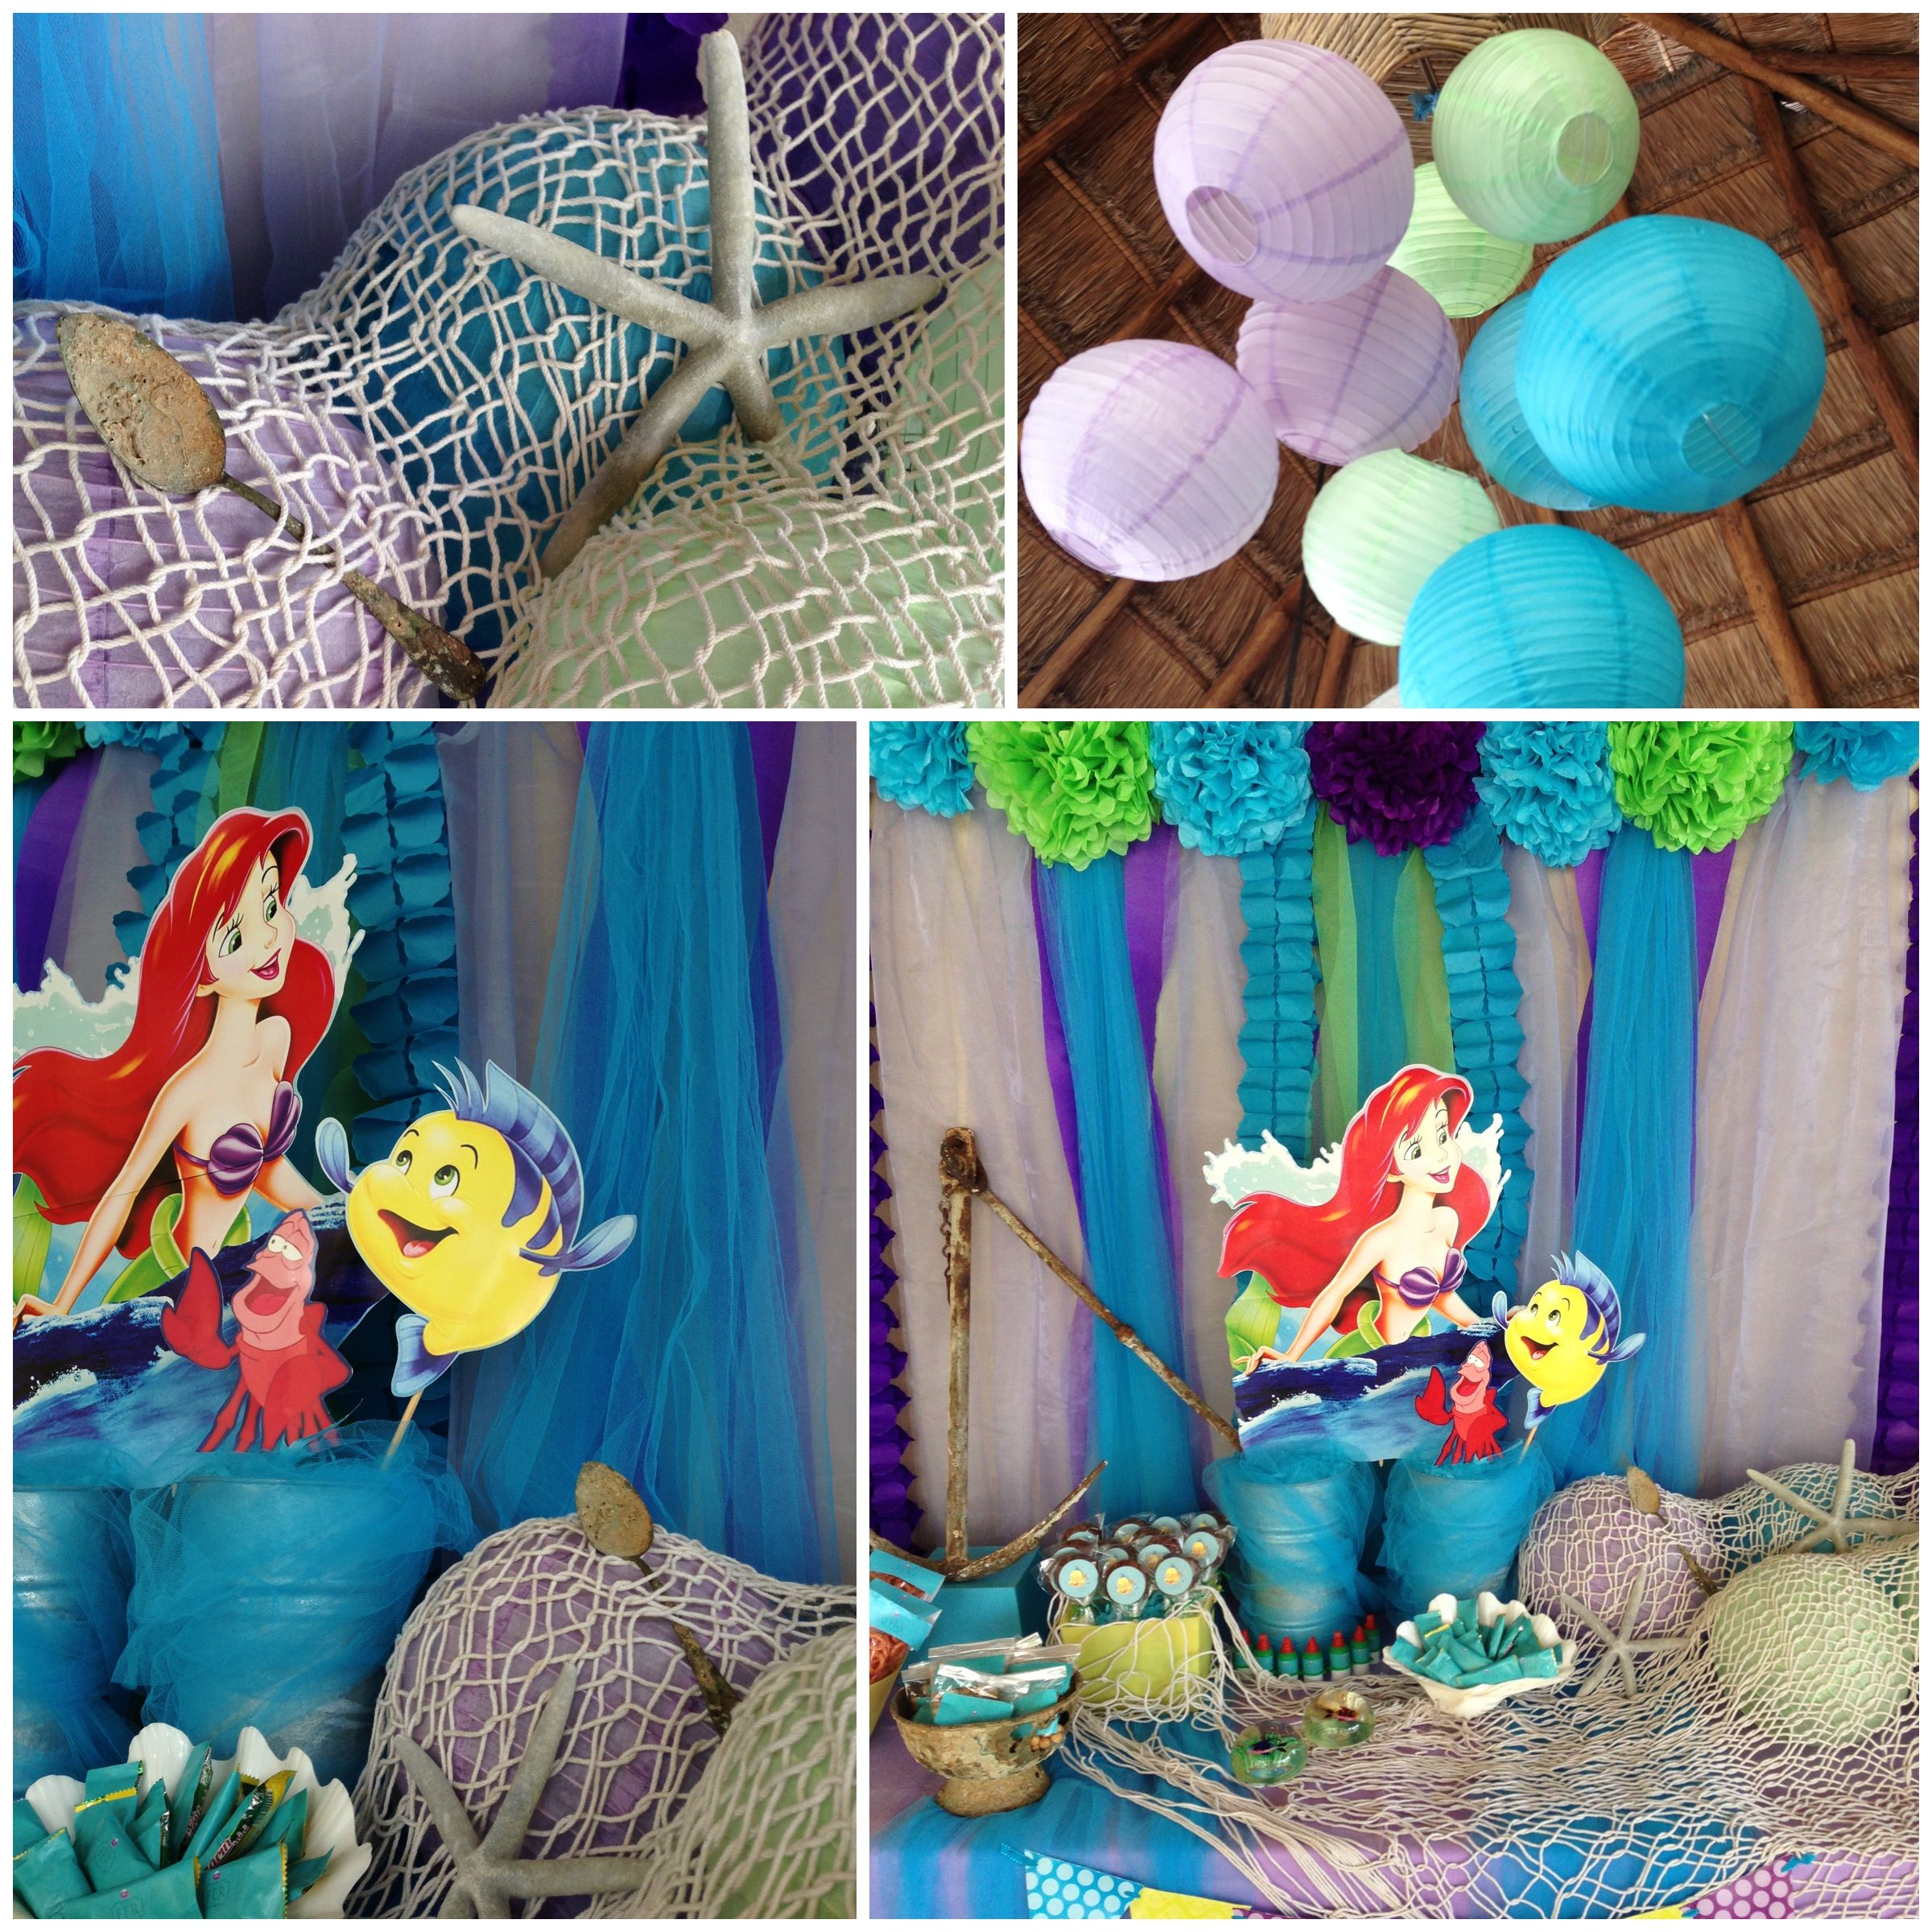 Little mermaid party party decorations pinterest for Ariel decoration party